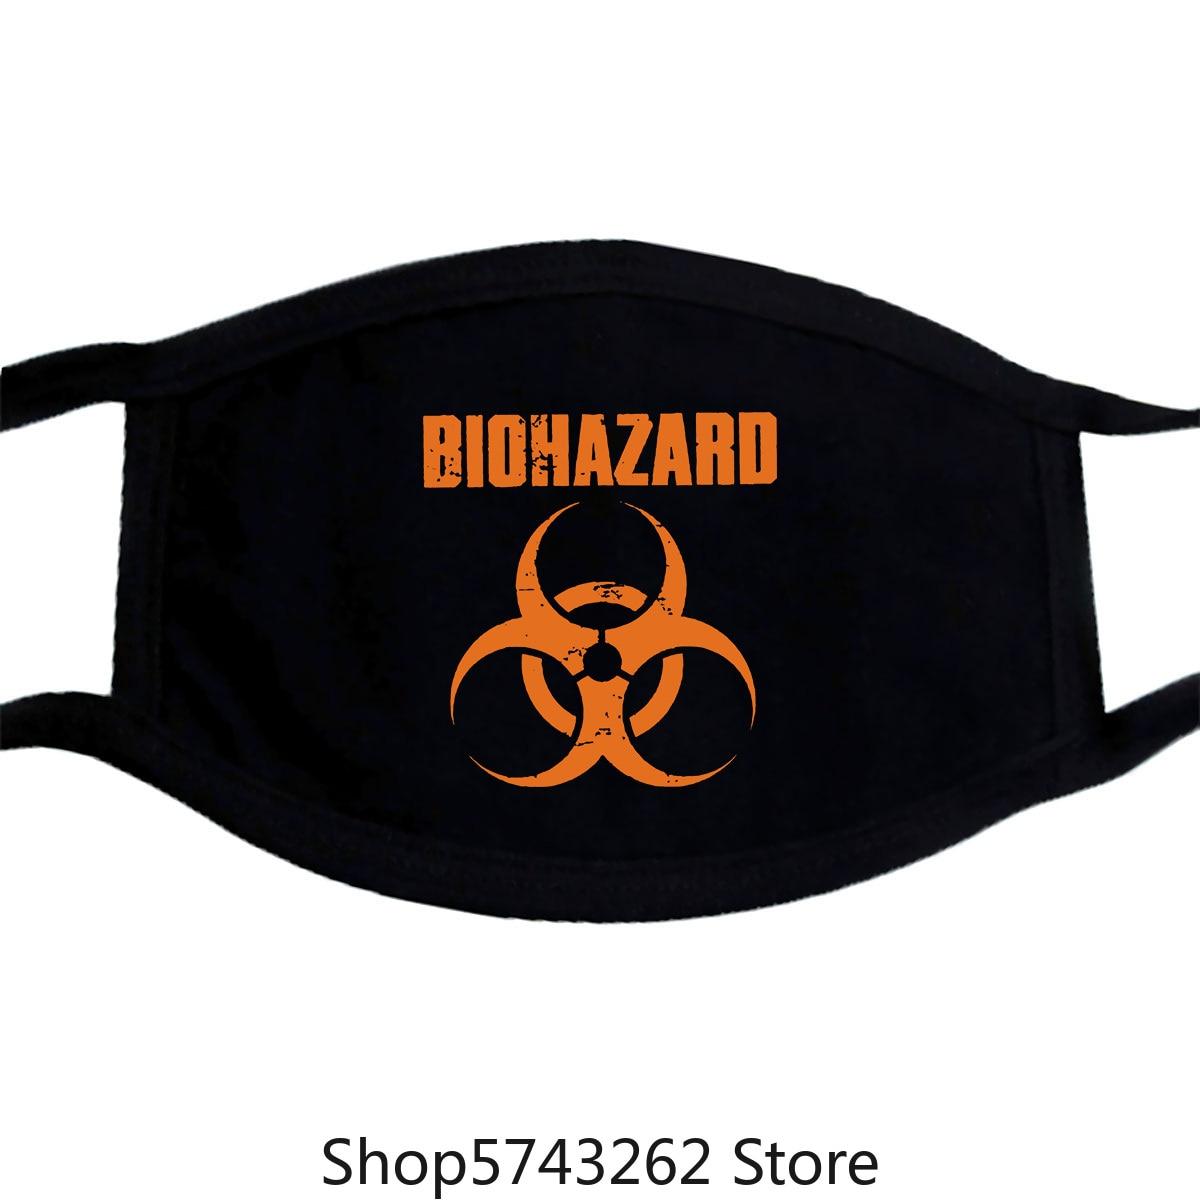 Biohazard Logo Mask S-Xxl Hardcore Metal Band Mask Washable Reusable Mask